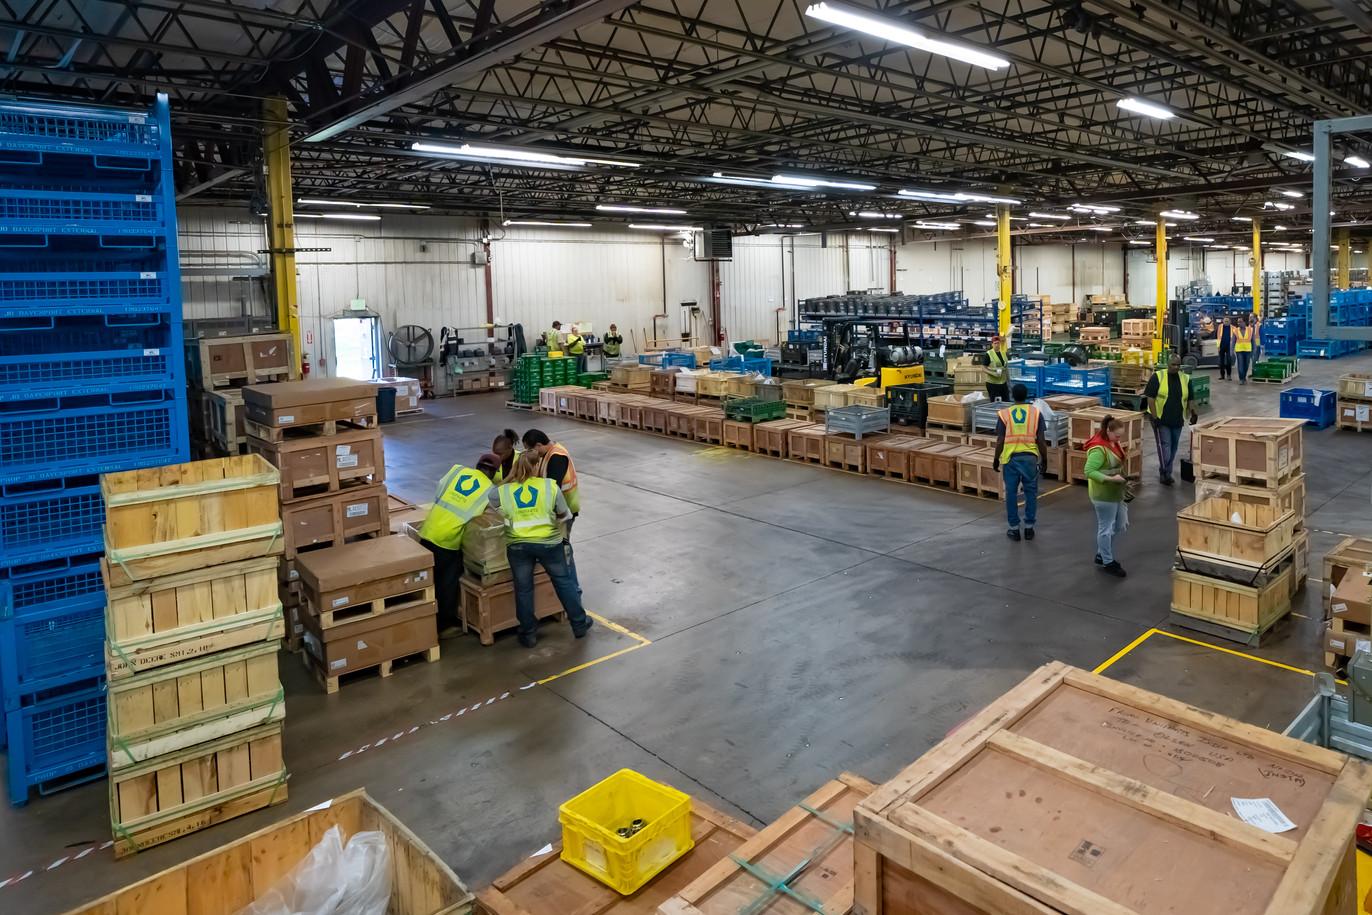 Eldridge Center Square - Warehouse Distribution